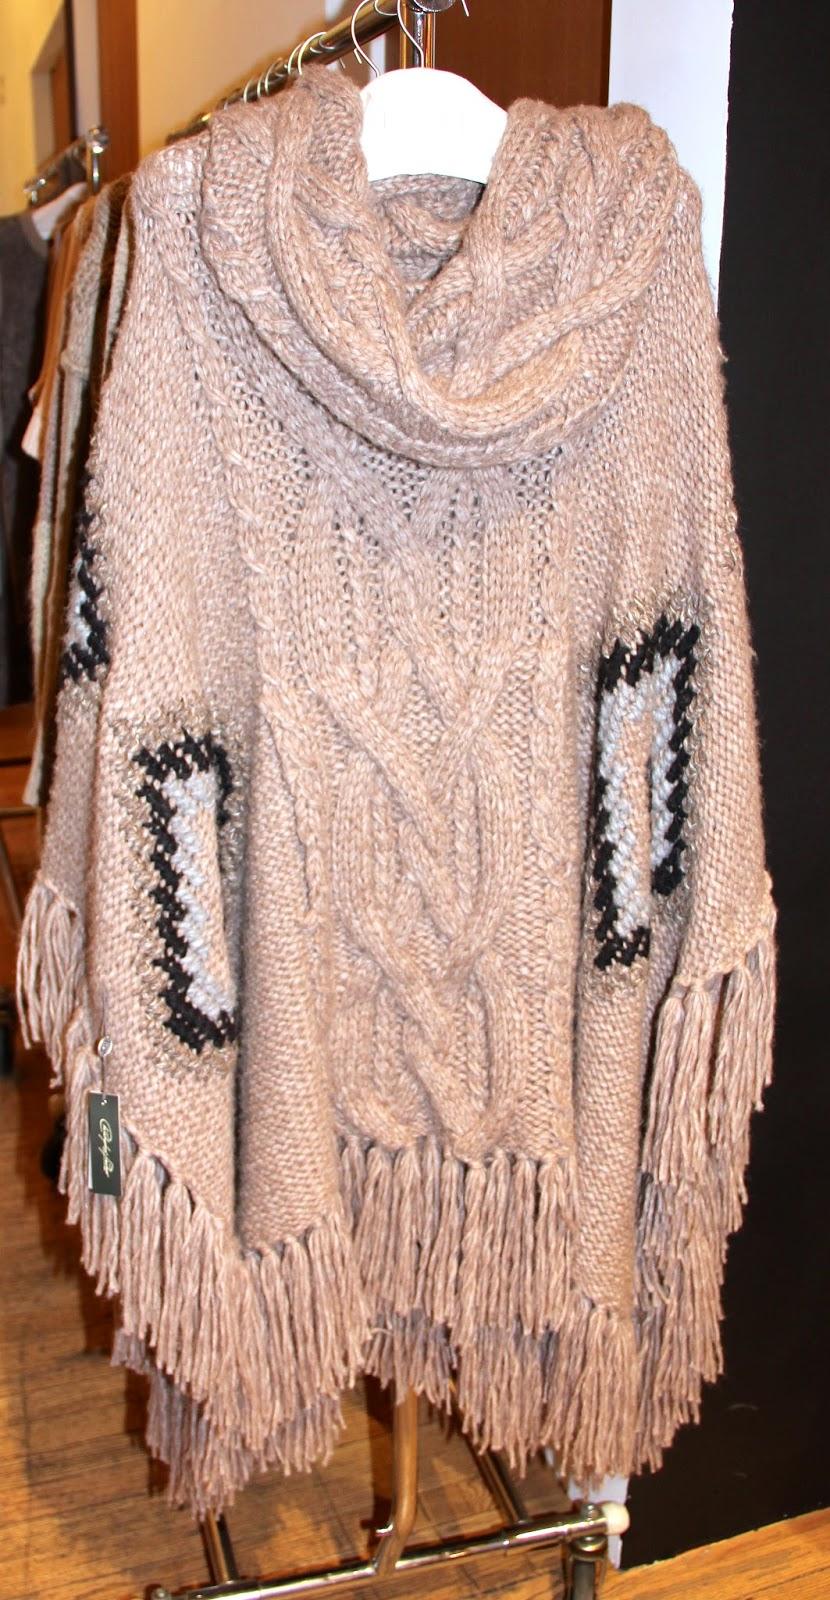 LYRA MAG.: Christopher Fischer Luxury Cashmere Collection ...